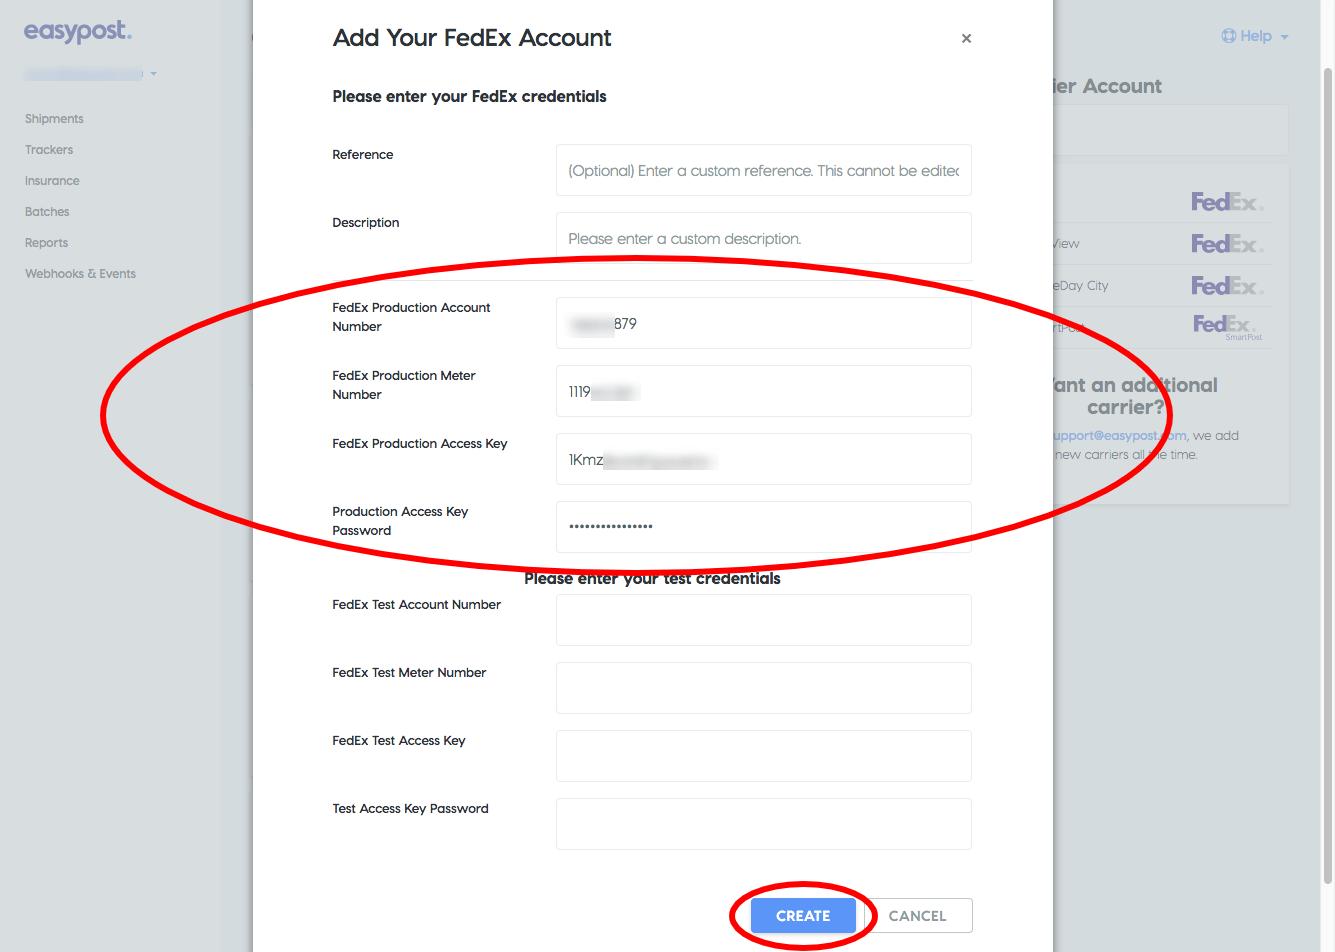 EasyPost FedEx credentials